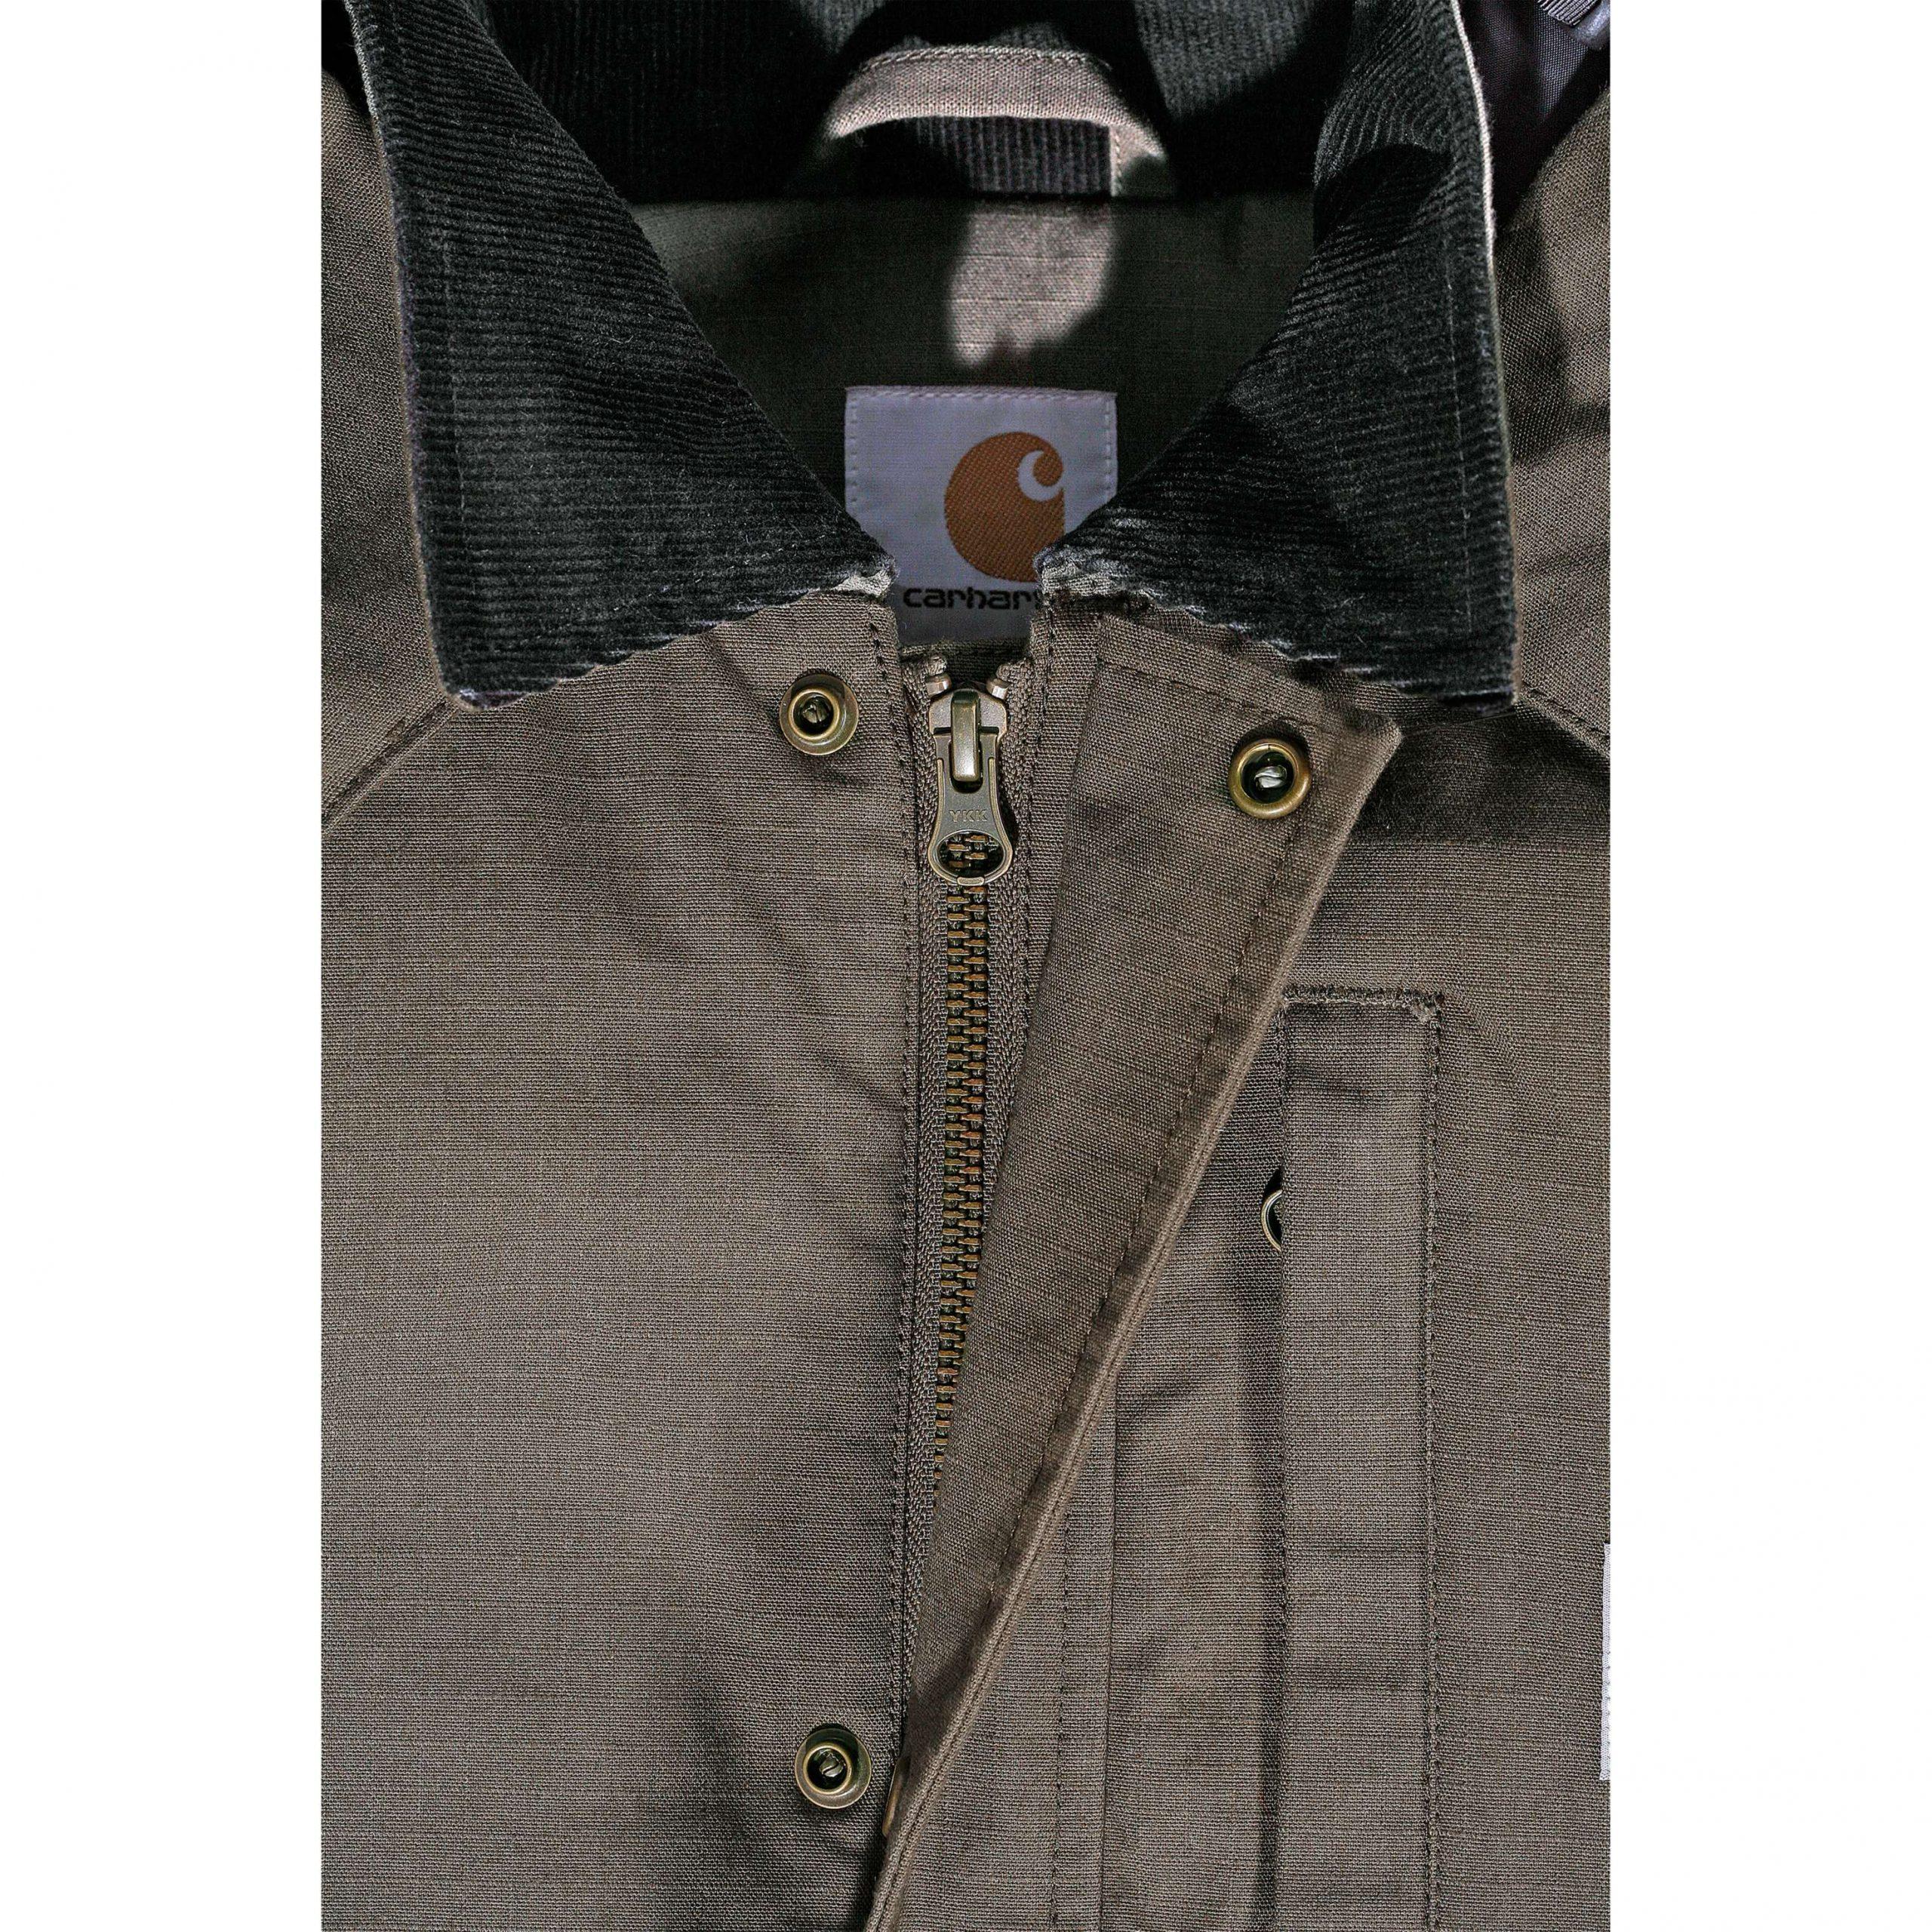 Fòret flanellskjorte, Carhartt Arbeidsfolk